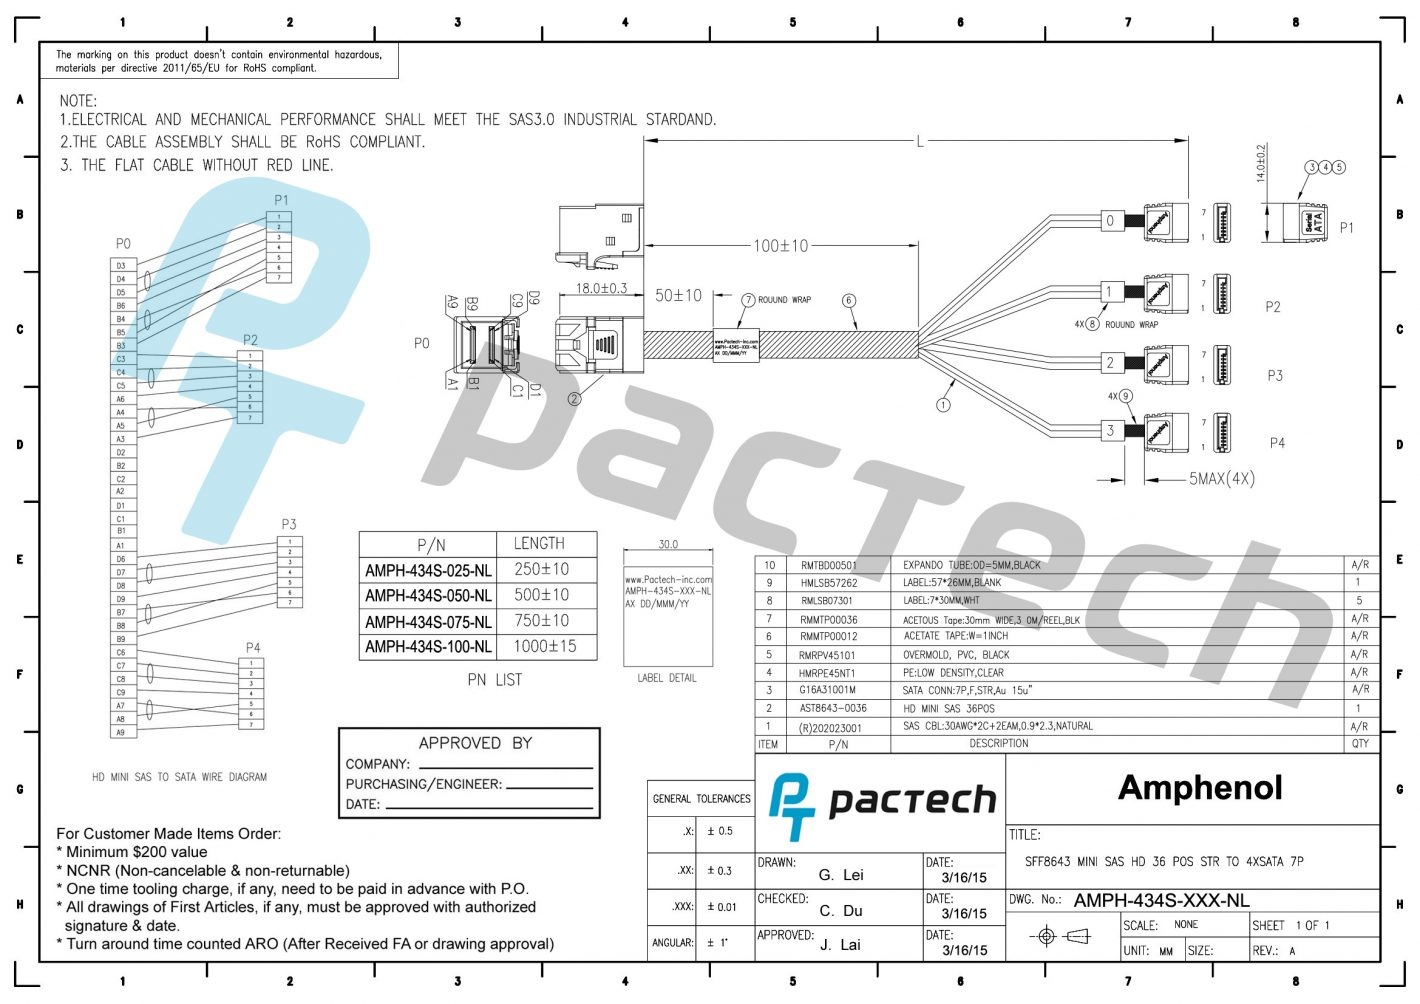 Amphenol 36 Pin Internal Mini Sas Hd To 4 X 7 Pin Sata